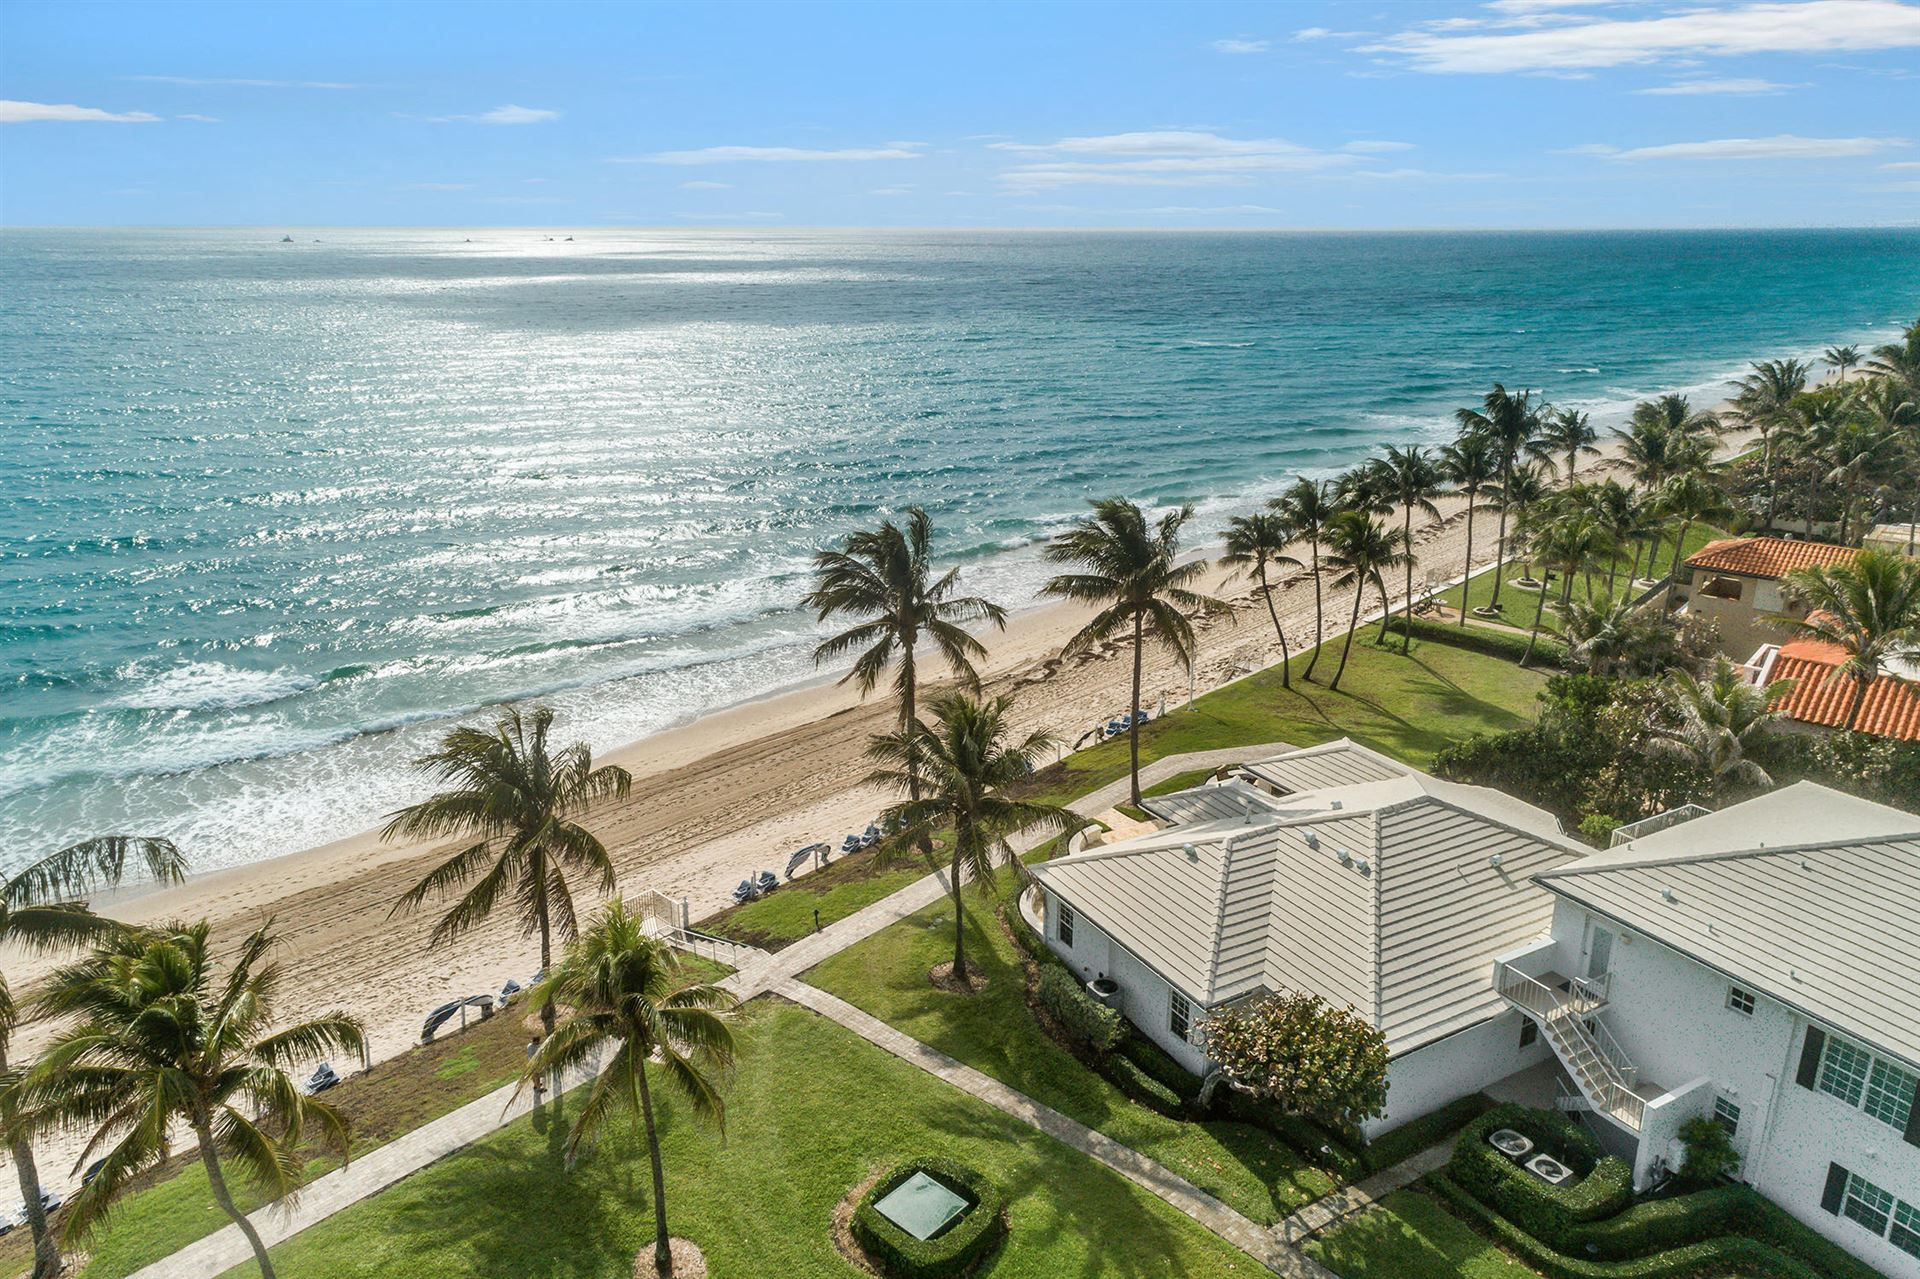 550 S Ocean Boulevard #101 E, Lantana, FL 33462 - #: RX-10609157